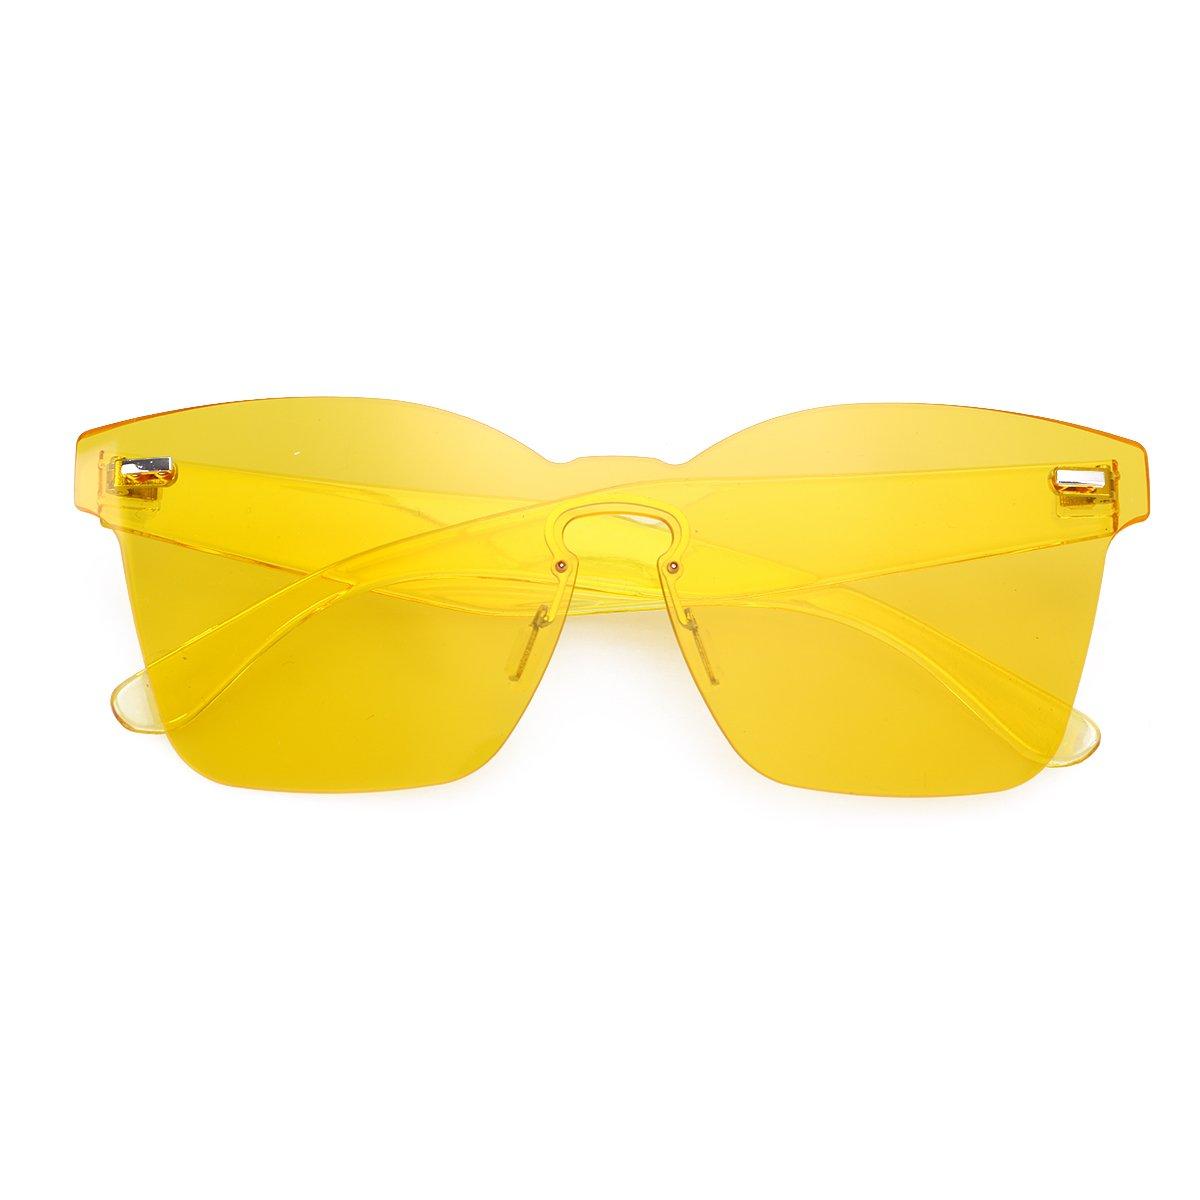 b186f87c1642 OULII Rimless Sunglasses Novelty Pratical Beach Seaside Sunglass Mirror  Summer Eyewear for Men Women (Yellow): Amazon.ca: Luggage & Bags